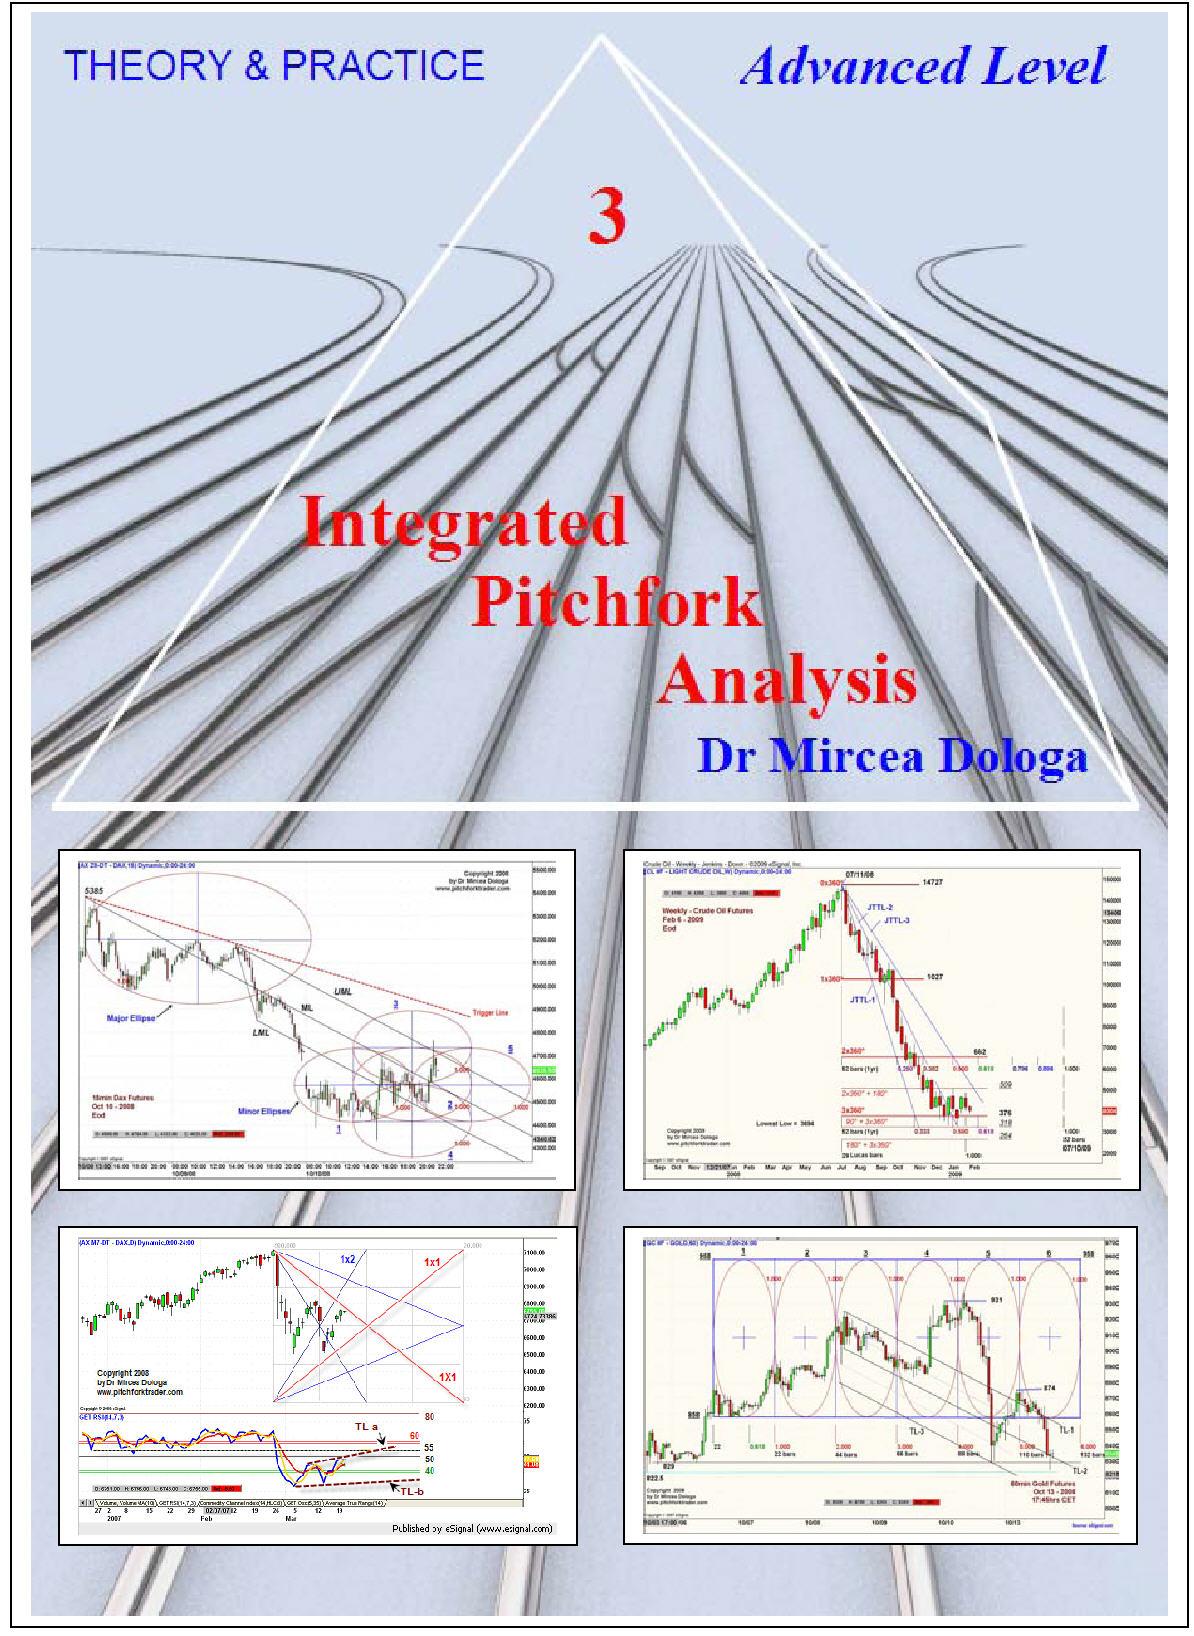 Integrated Pitchfork Analysis – Advanced Level, Volume III